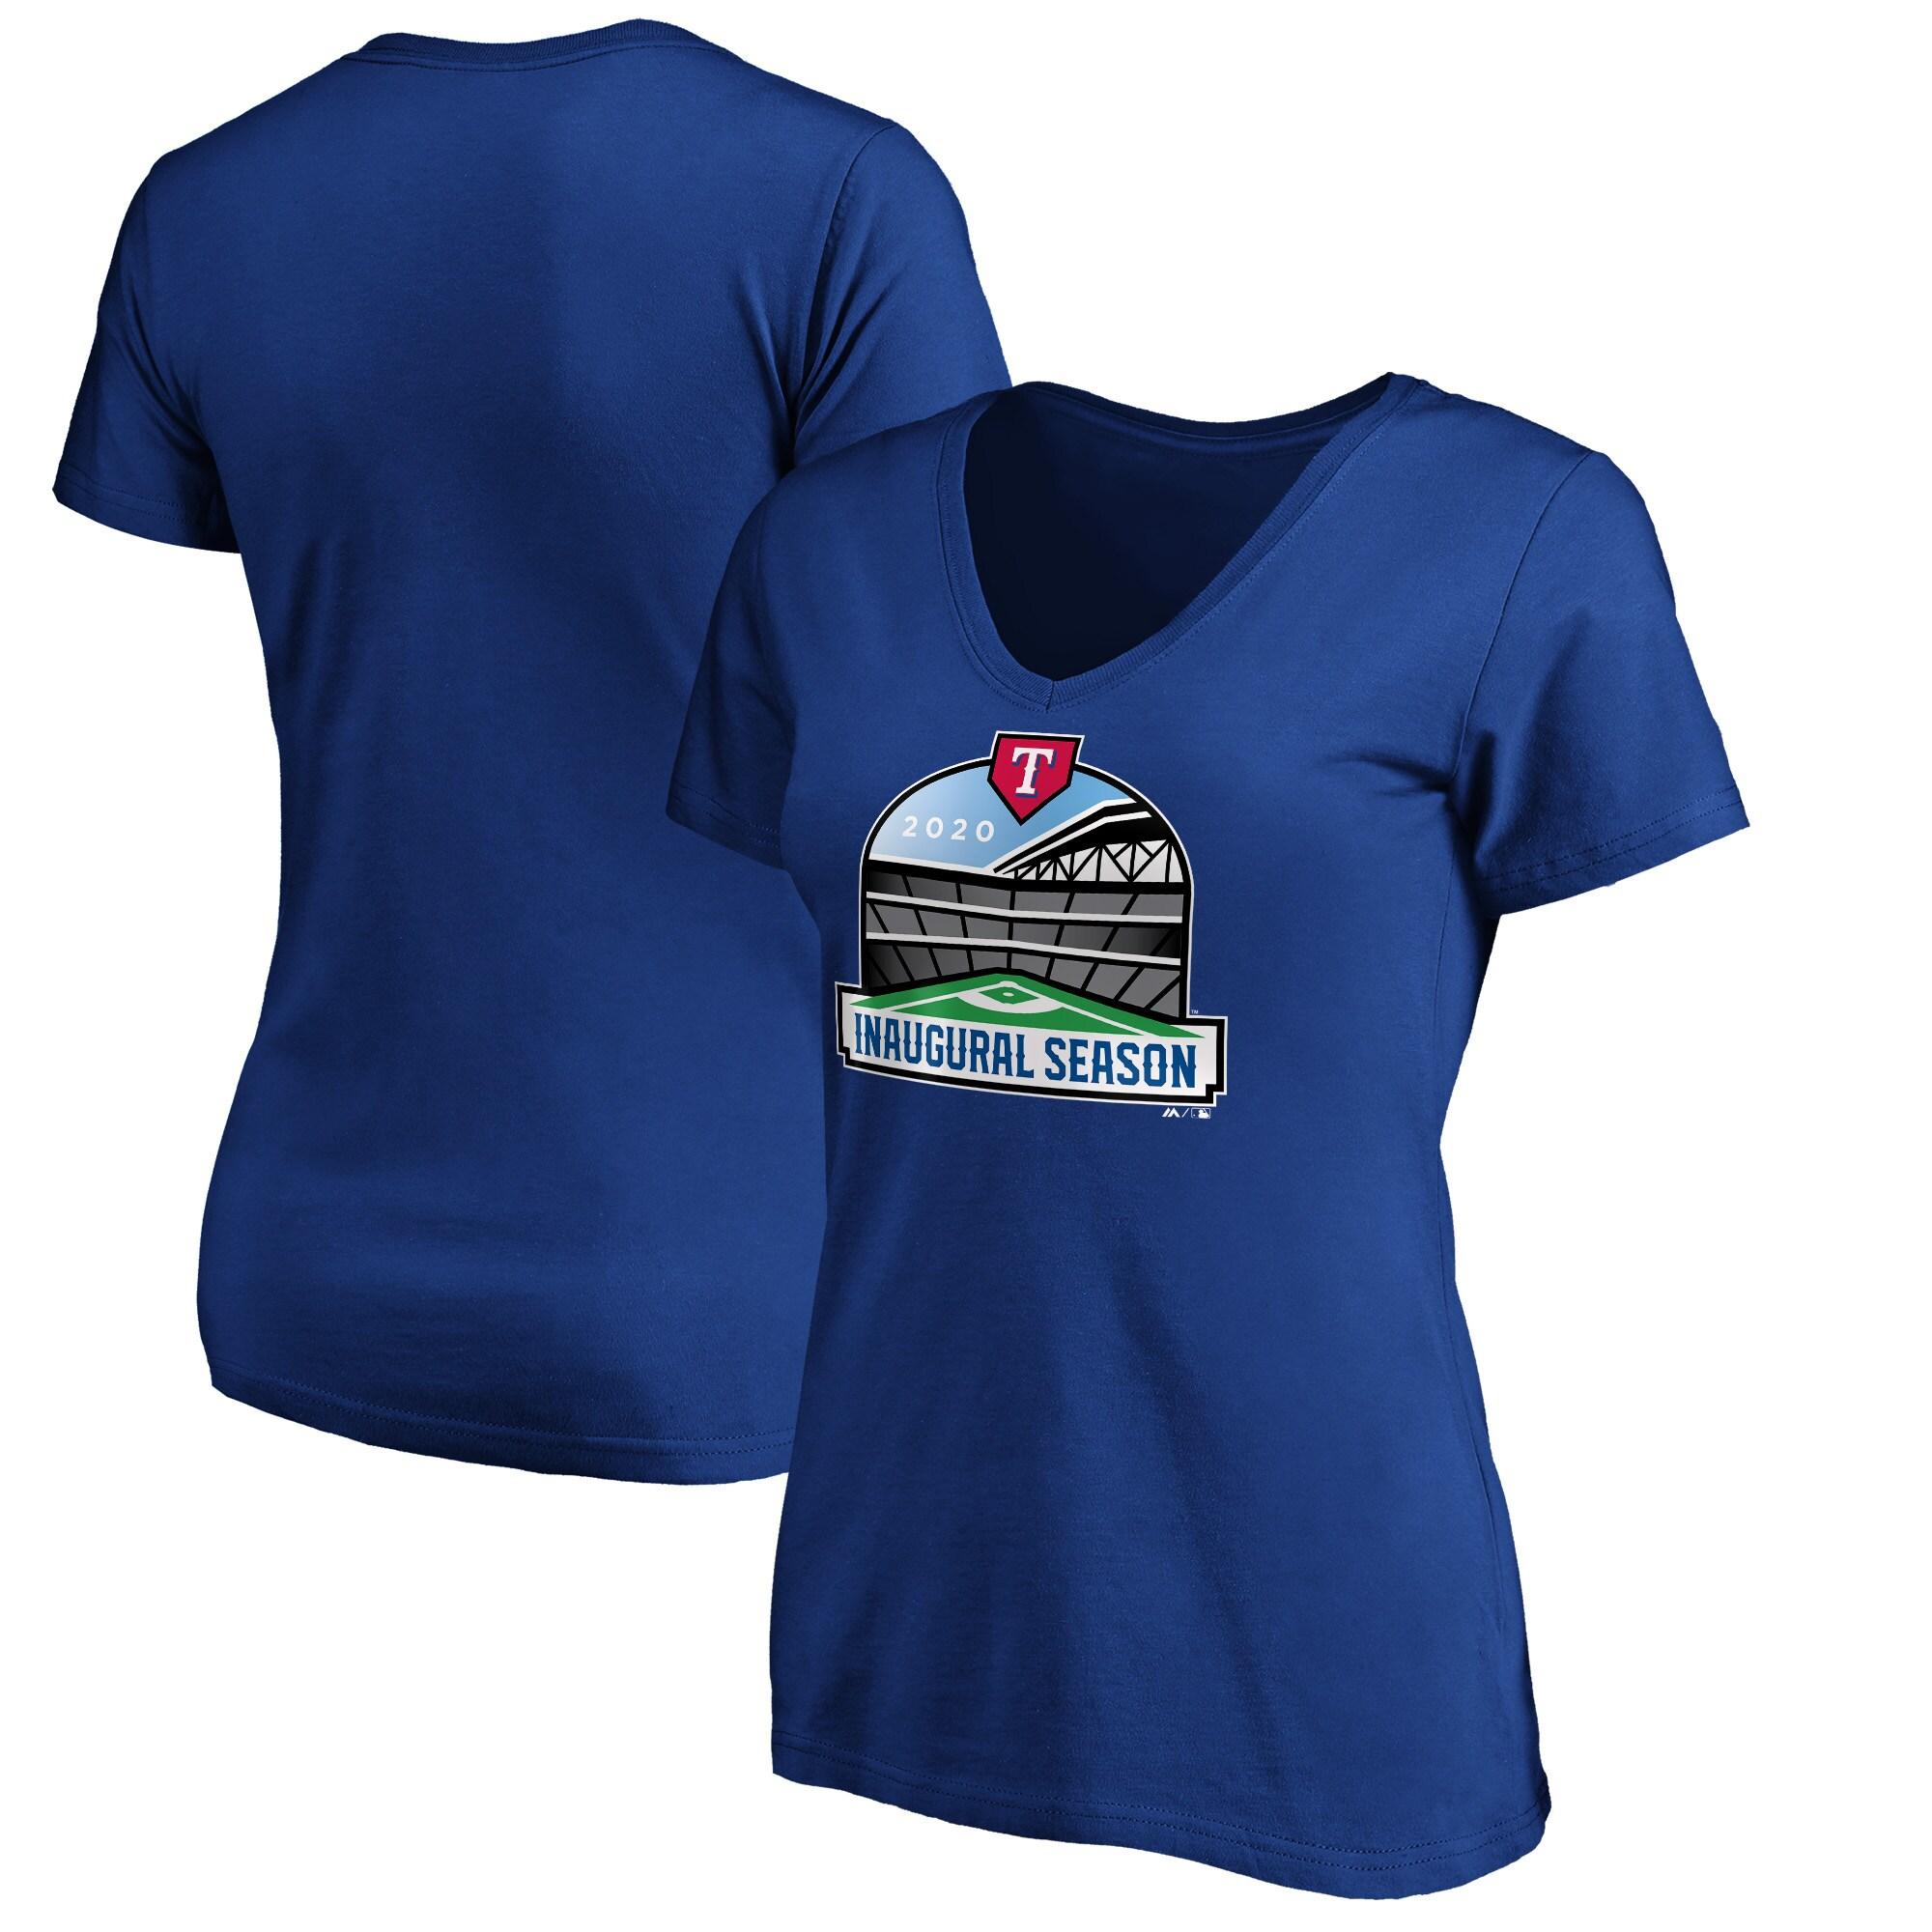 Texas Rangers Majestic Women's 2020 Inaugural Season Patch V-Neck T-Shirt - Royal